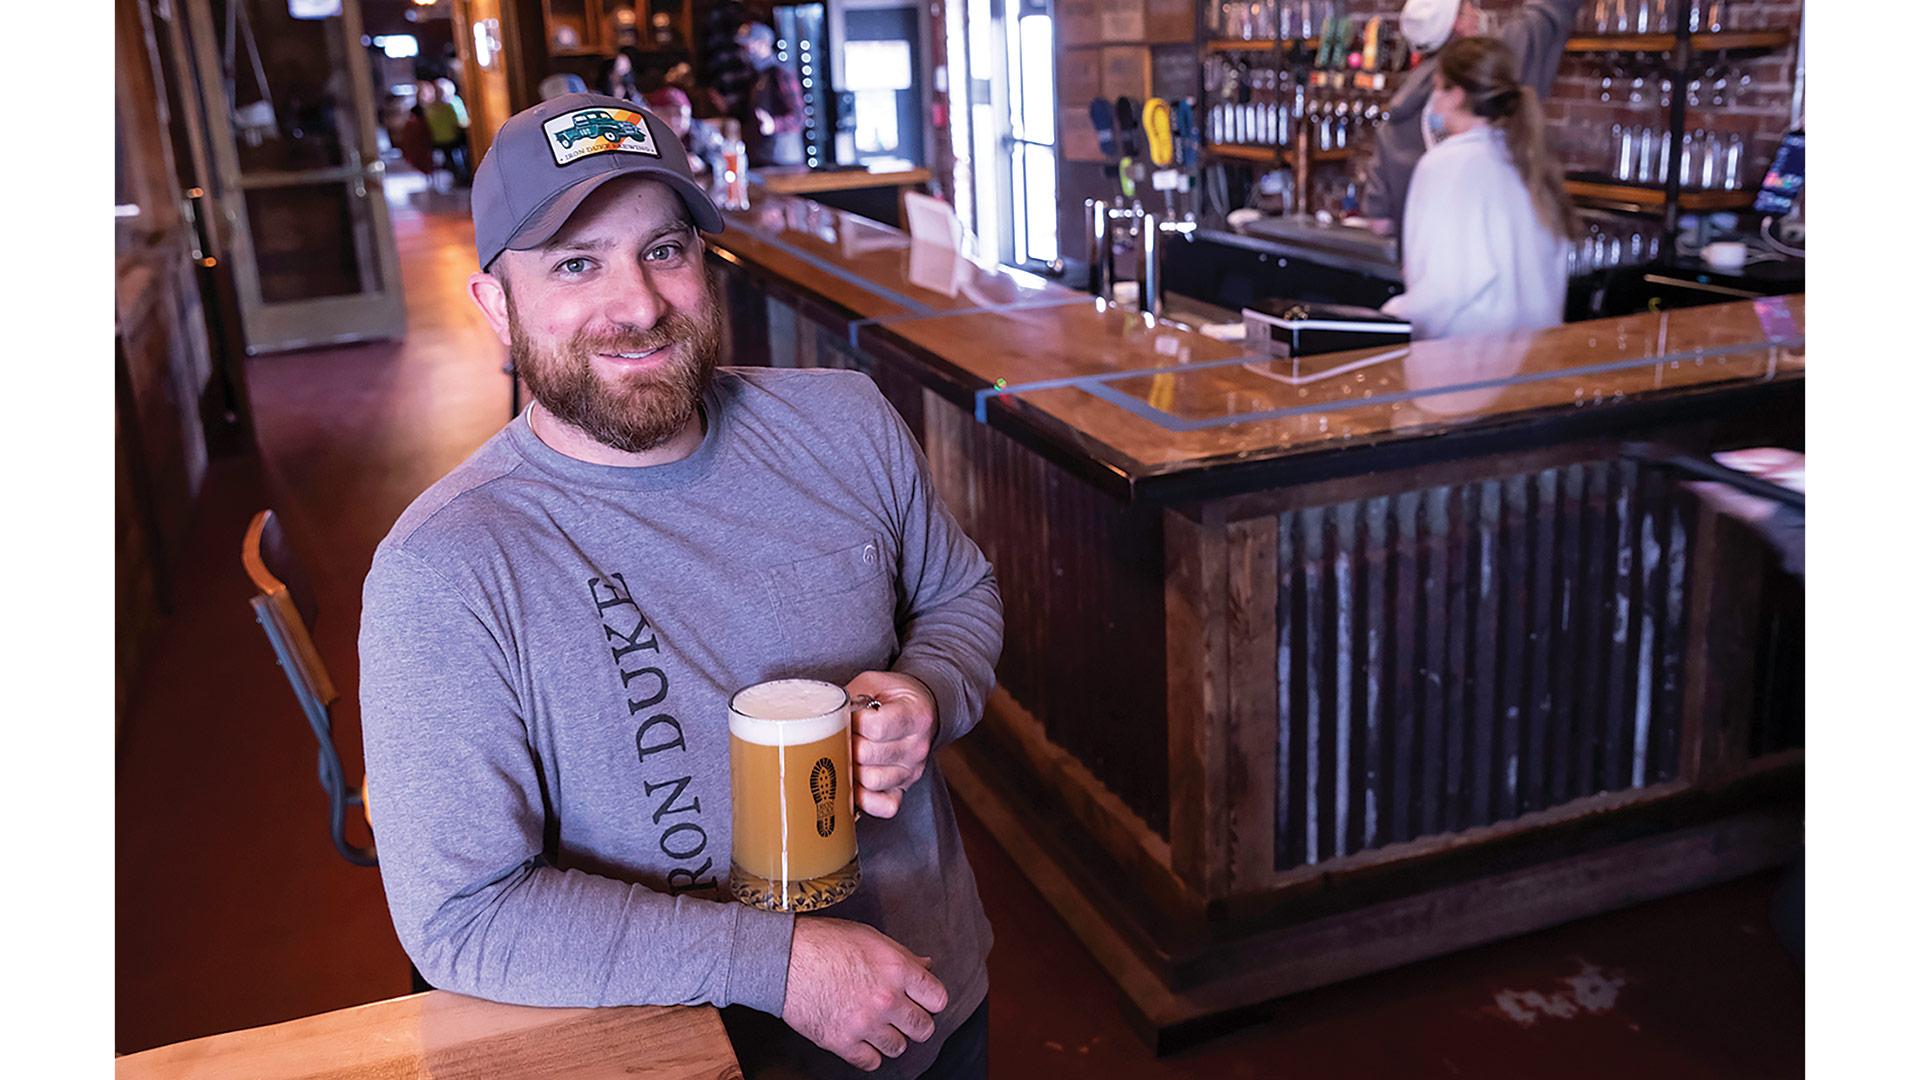 Nick Moran, founder of Iron Duke Brewing